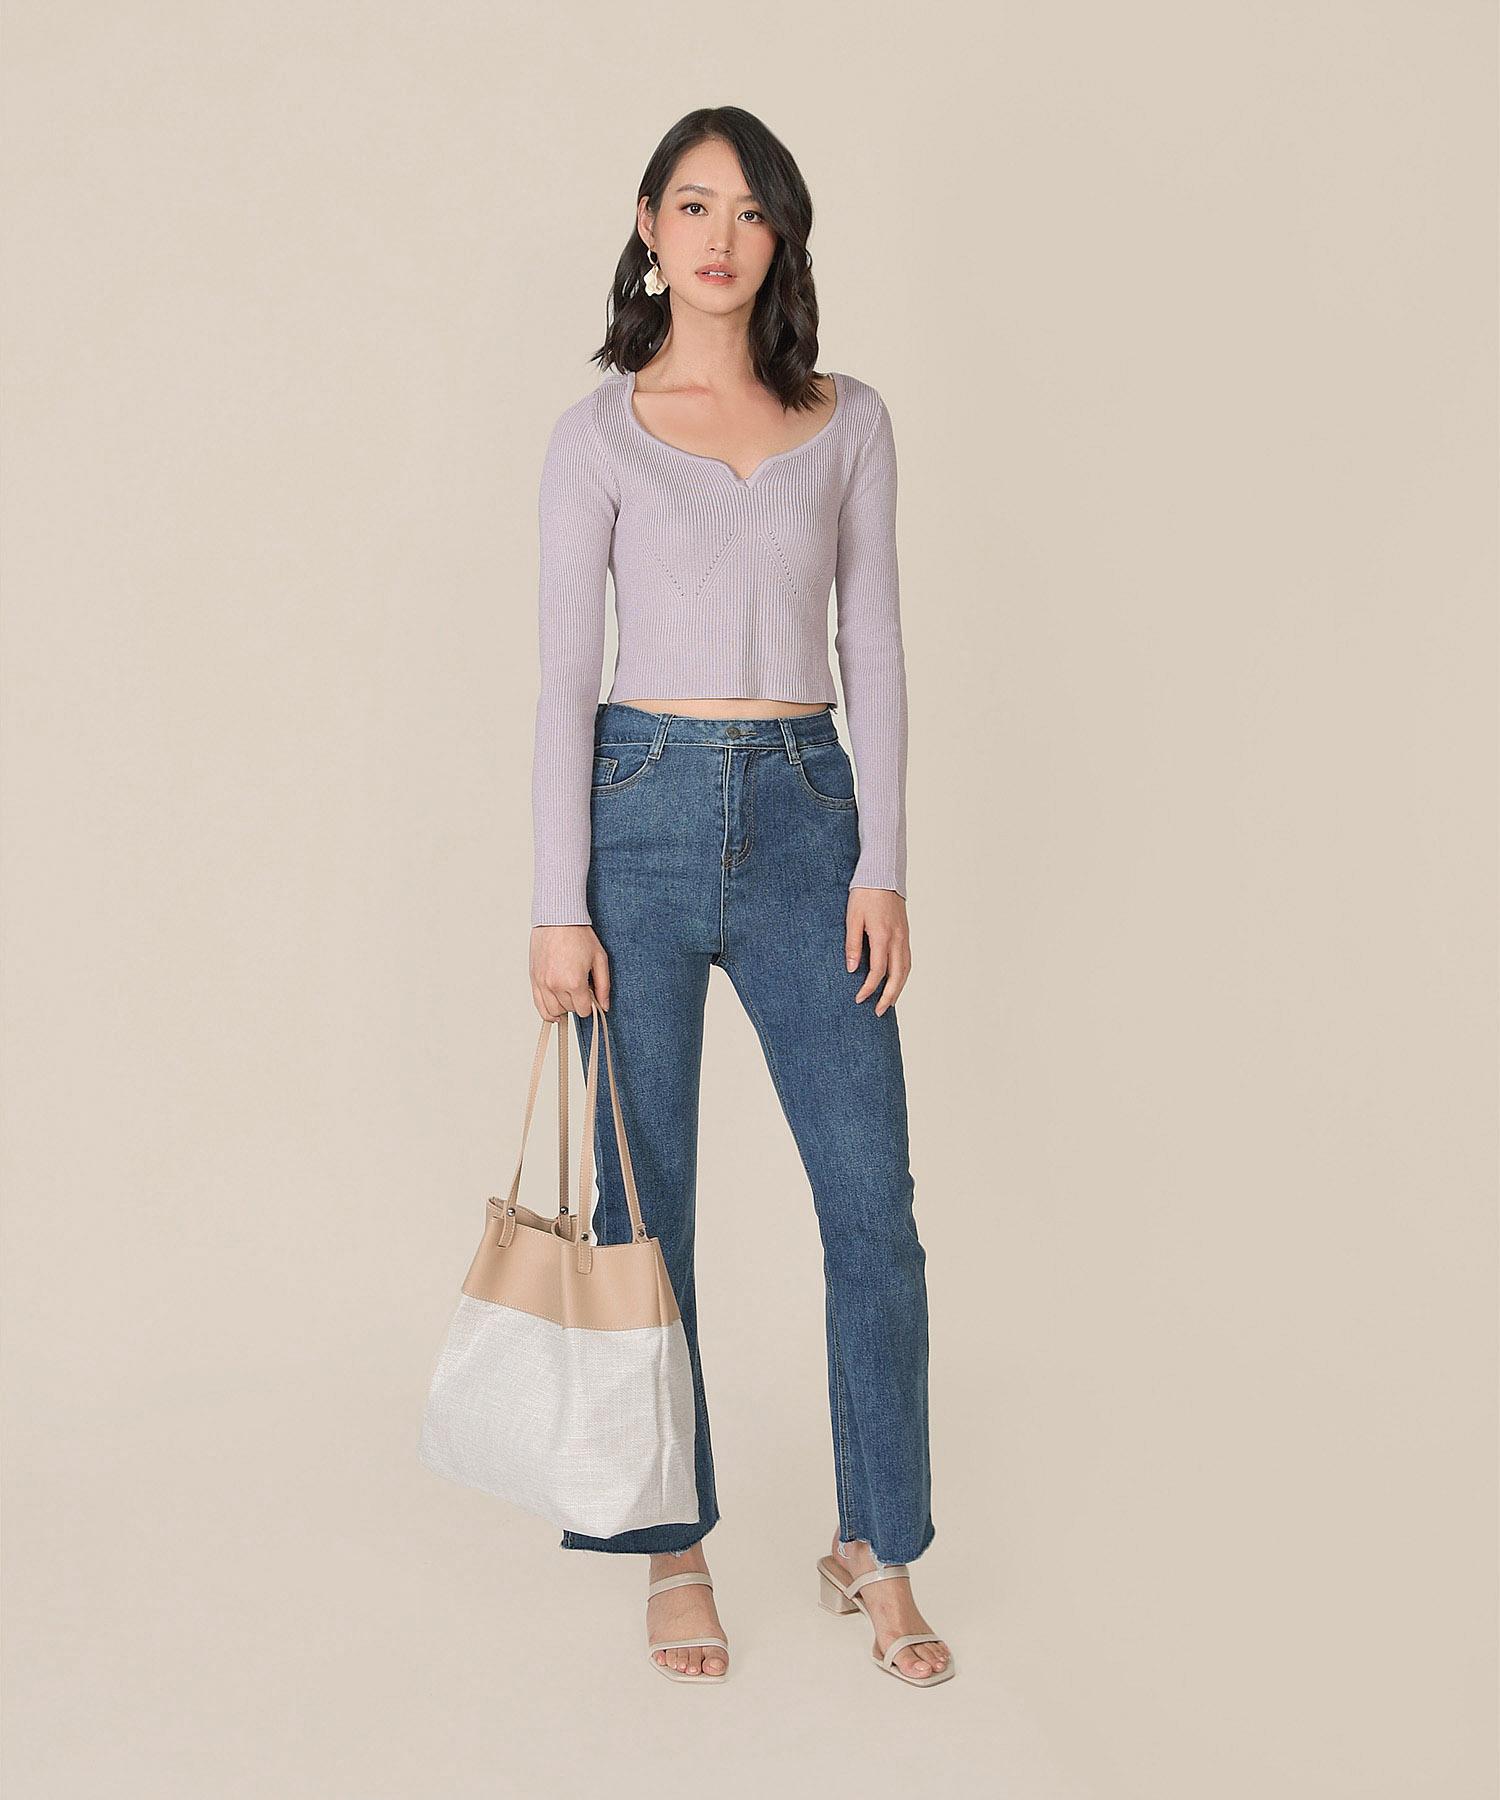 rio-vista-knit-top-pale-lavender-1